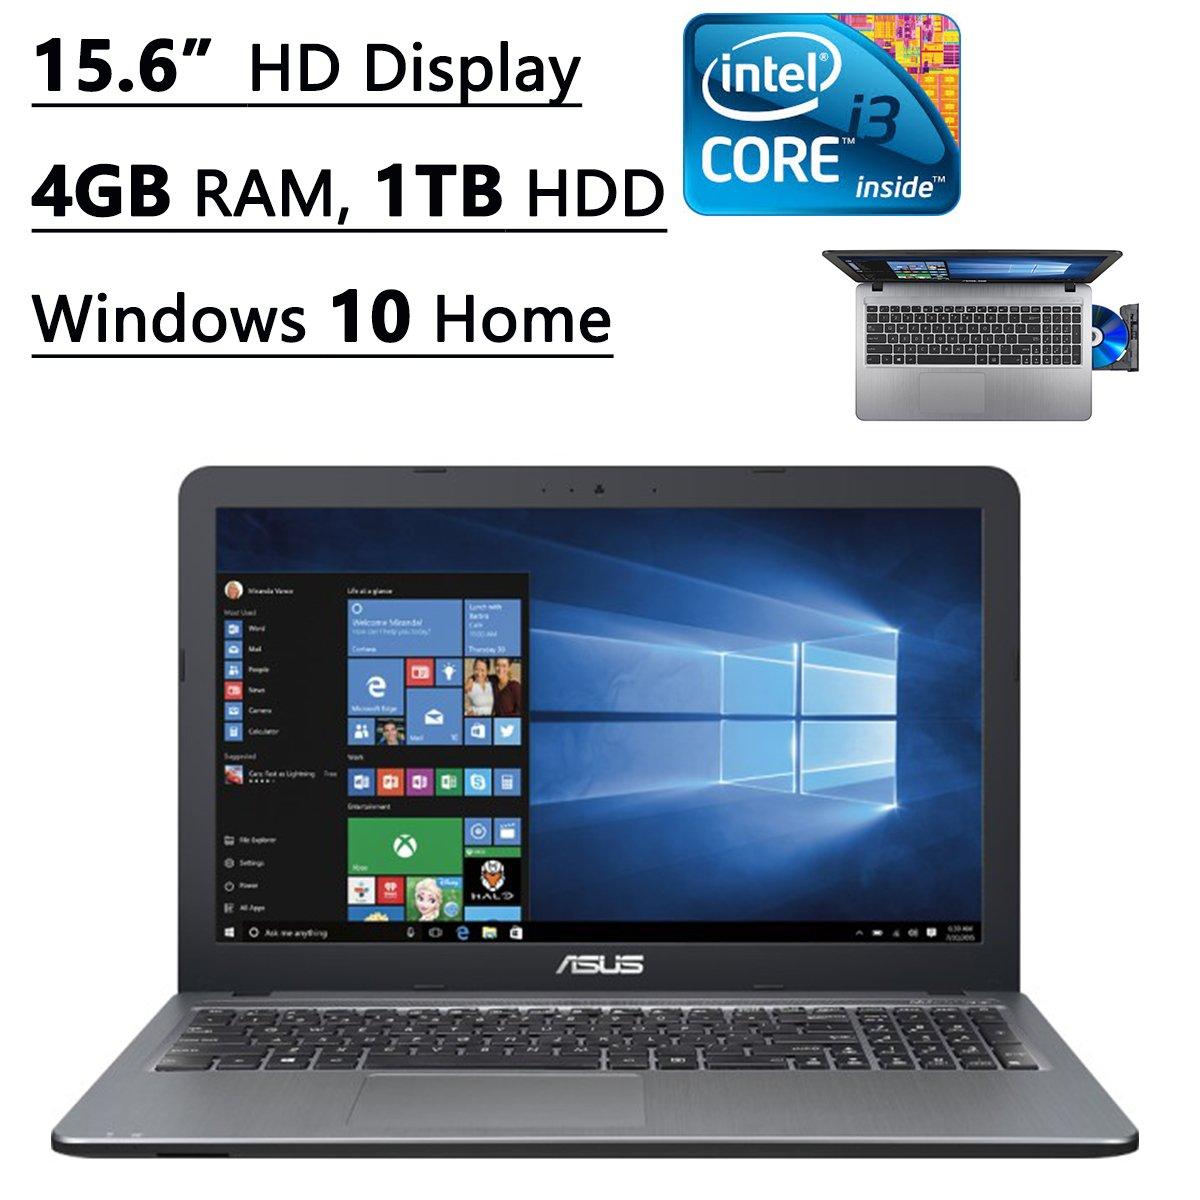 Asus X540LA-SI30205P 15.6-Inch Flagship Premium Laptop (Intel Core i3-5020U 2.2GHz Processor, 4GB DDR3, 1TB HDD, Windows 10) Silver by Asus